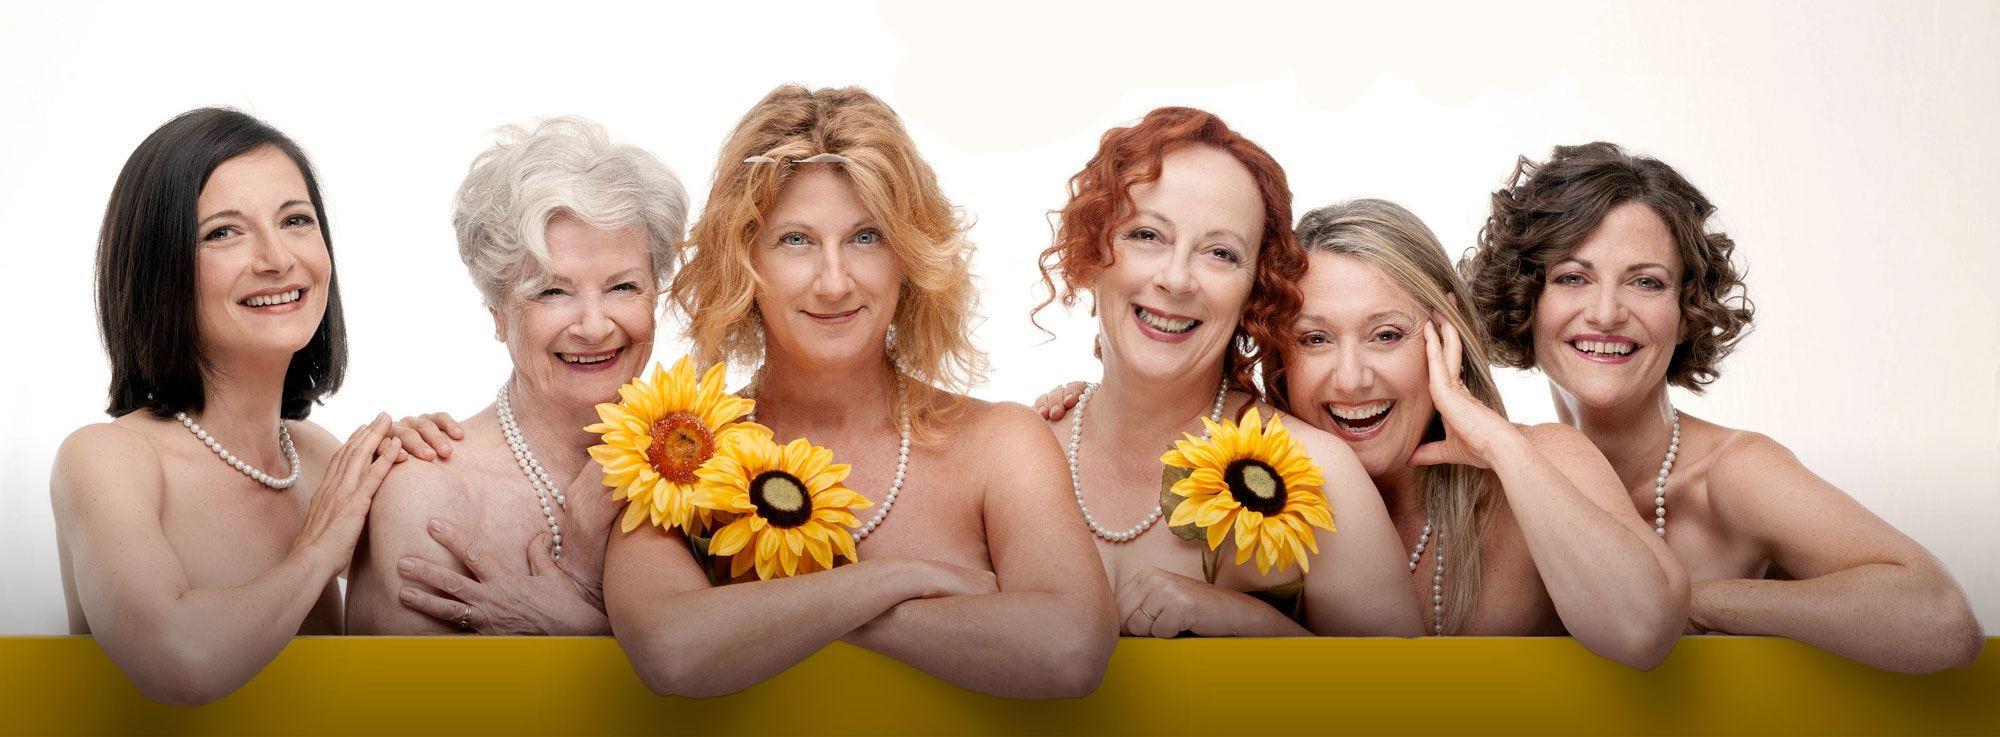 Francavilla Fontana: Calendar Girls